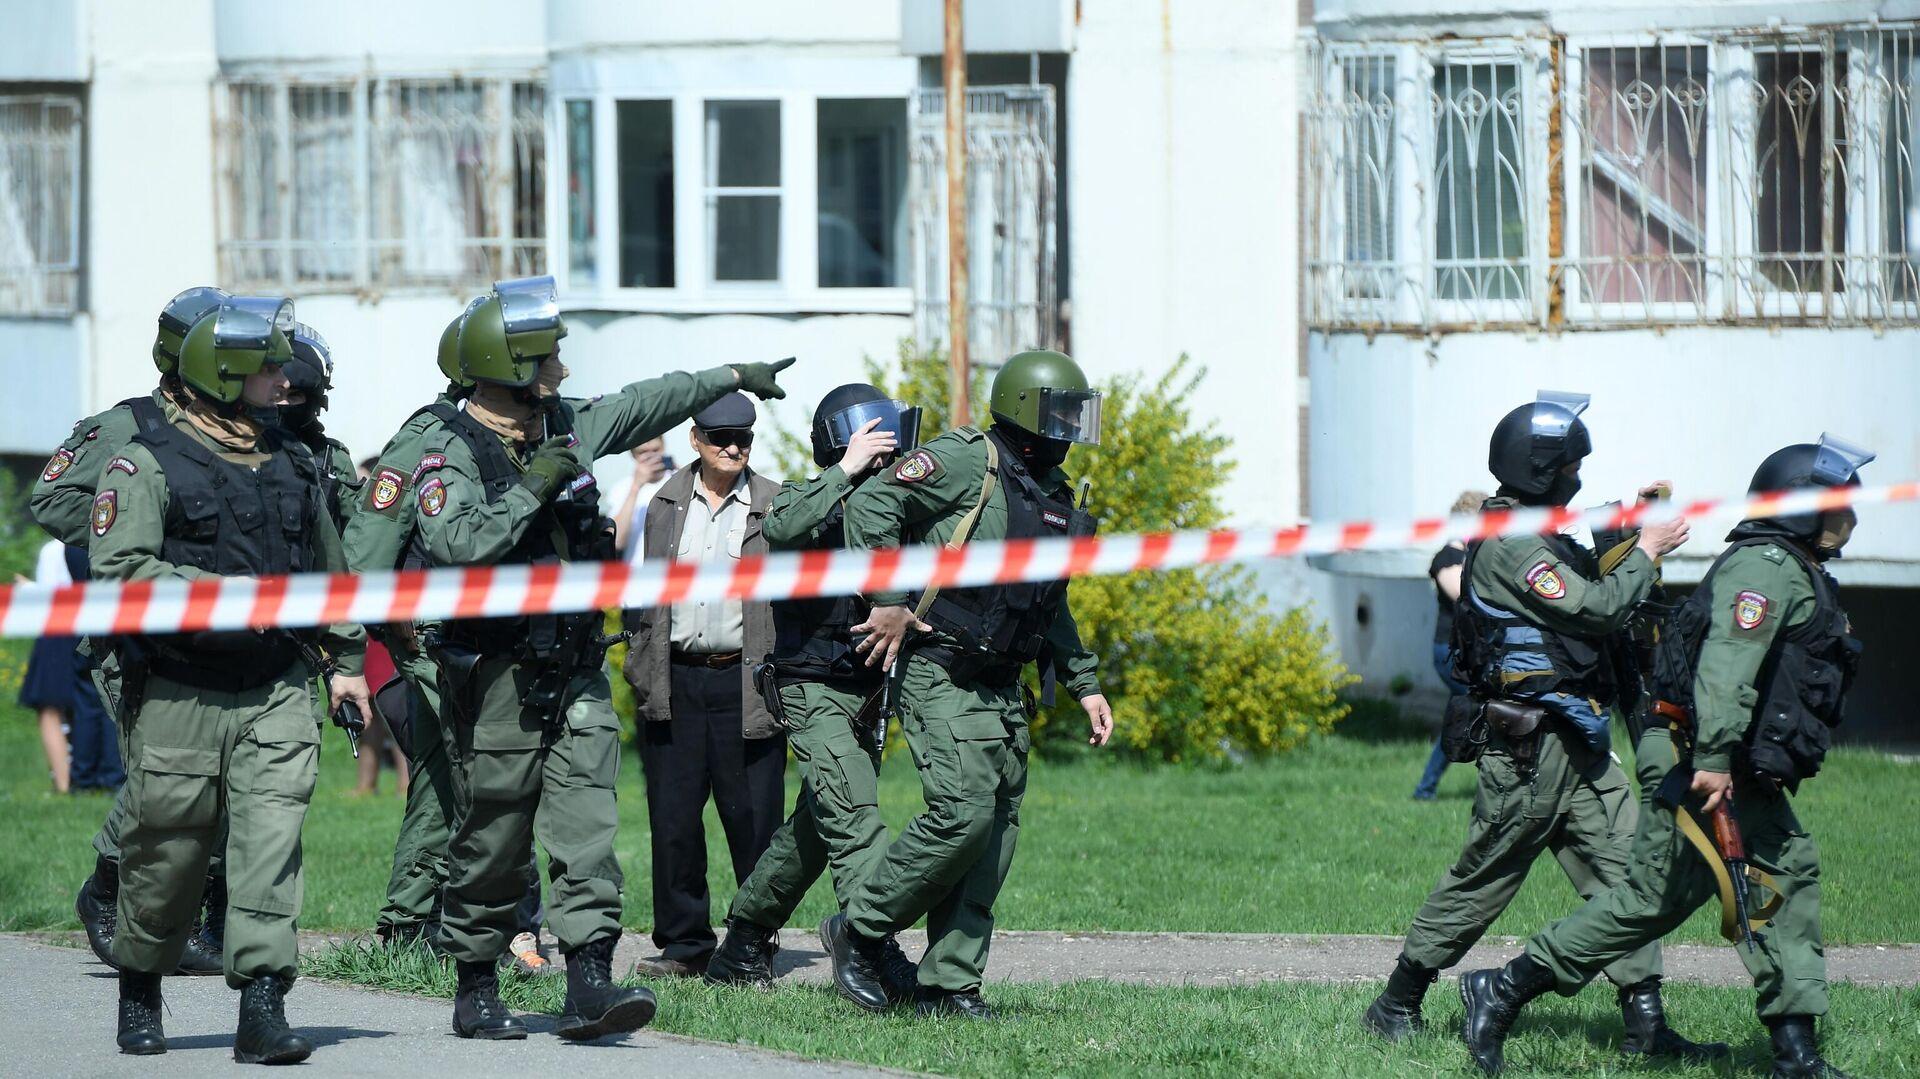 Agentes de seguridad cerca de la escuela en Kazán donde se produjo un tiroteo - Sputnik Mundo, 1920, 11.05.2021